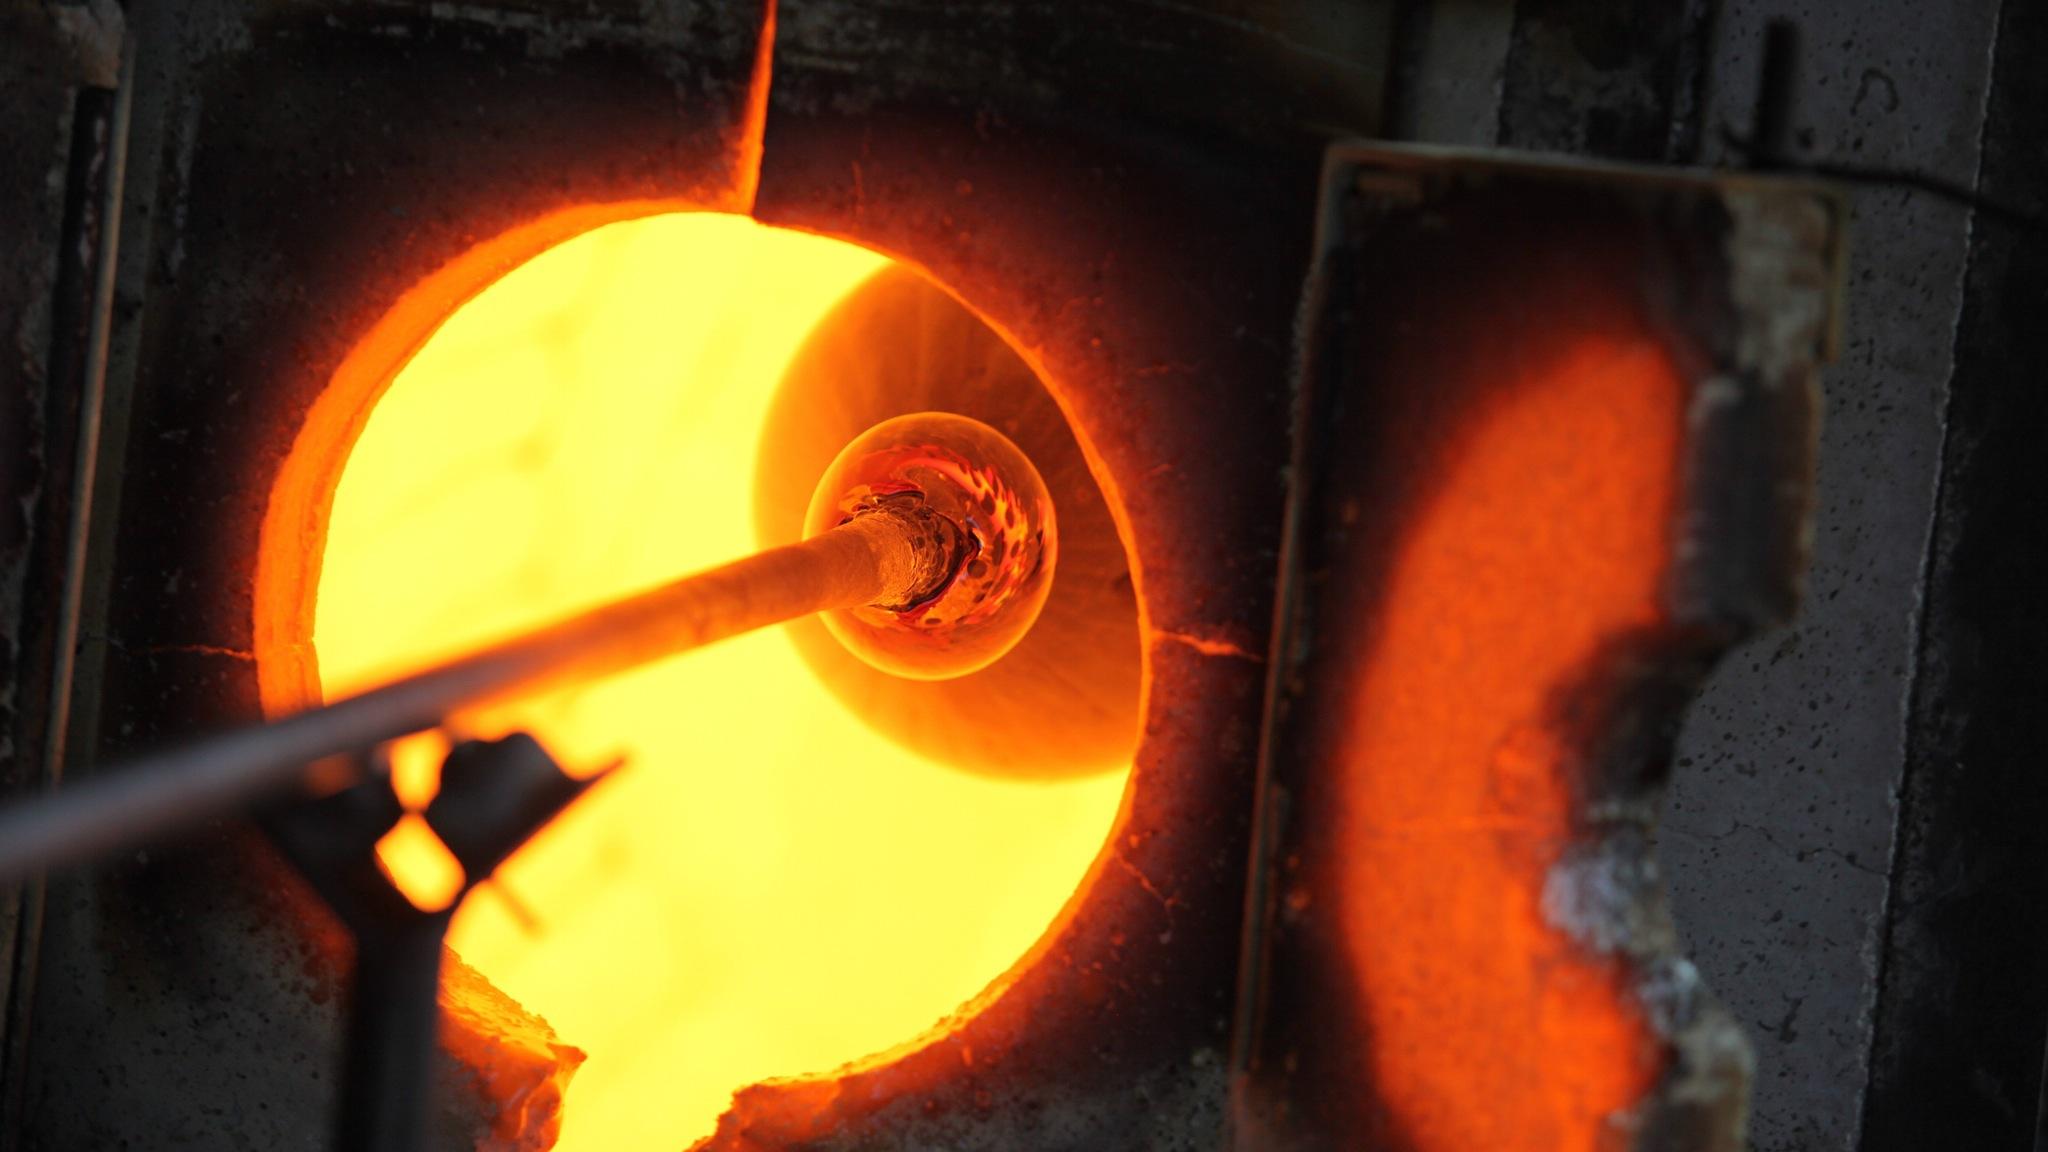 Healesville Glass Blowing Studio